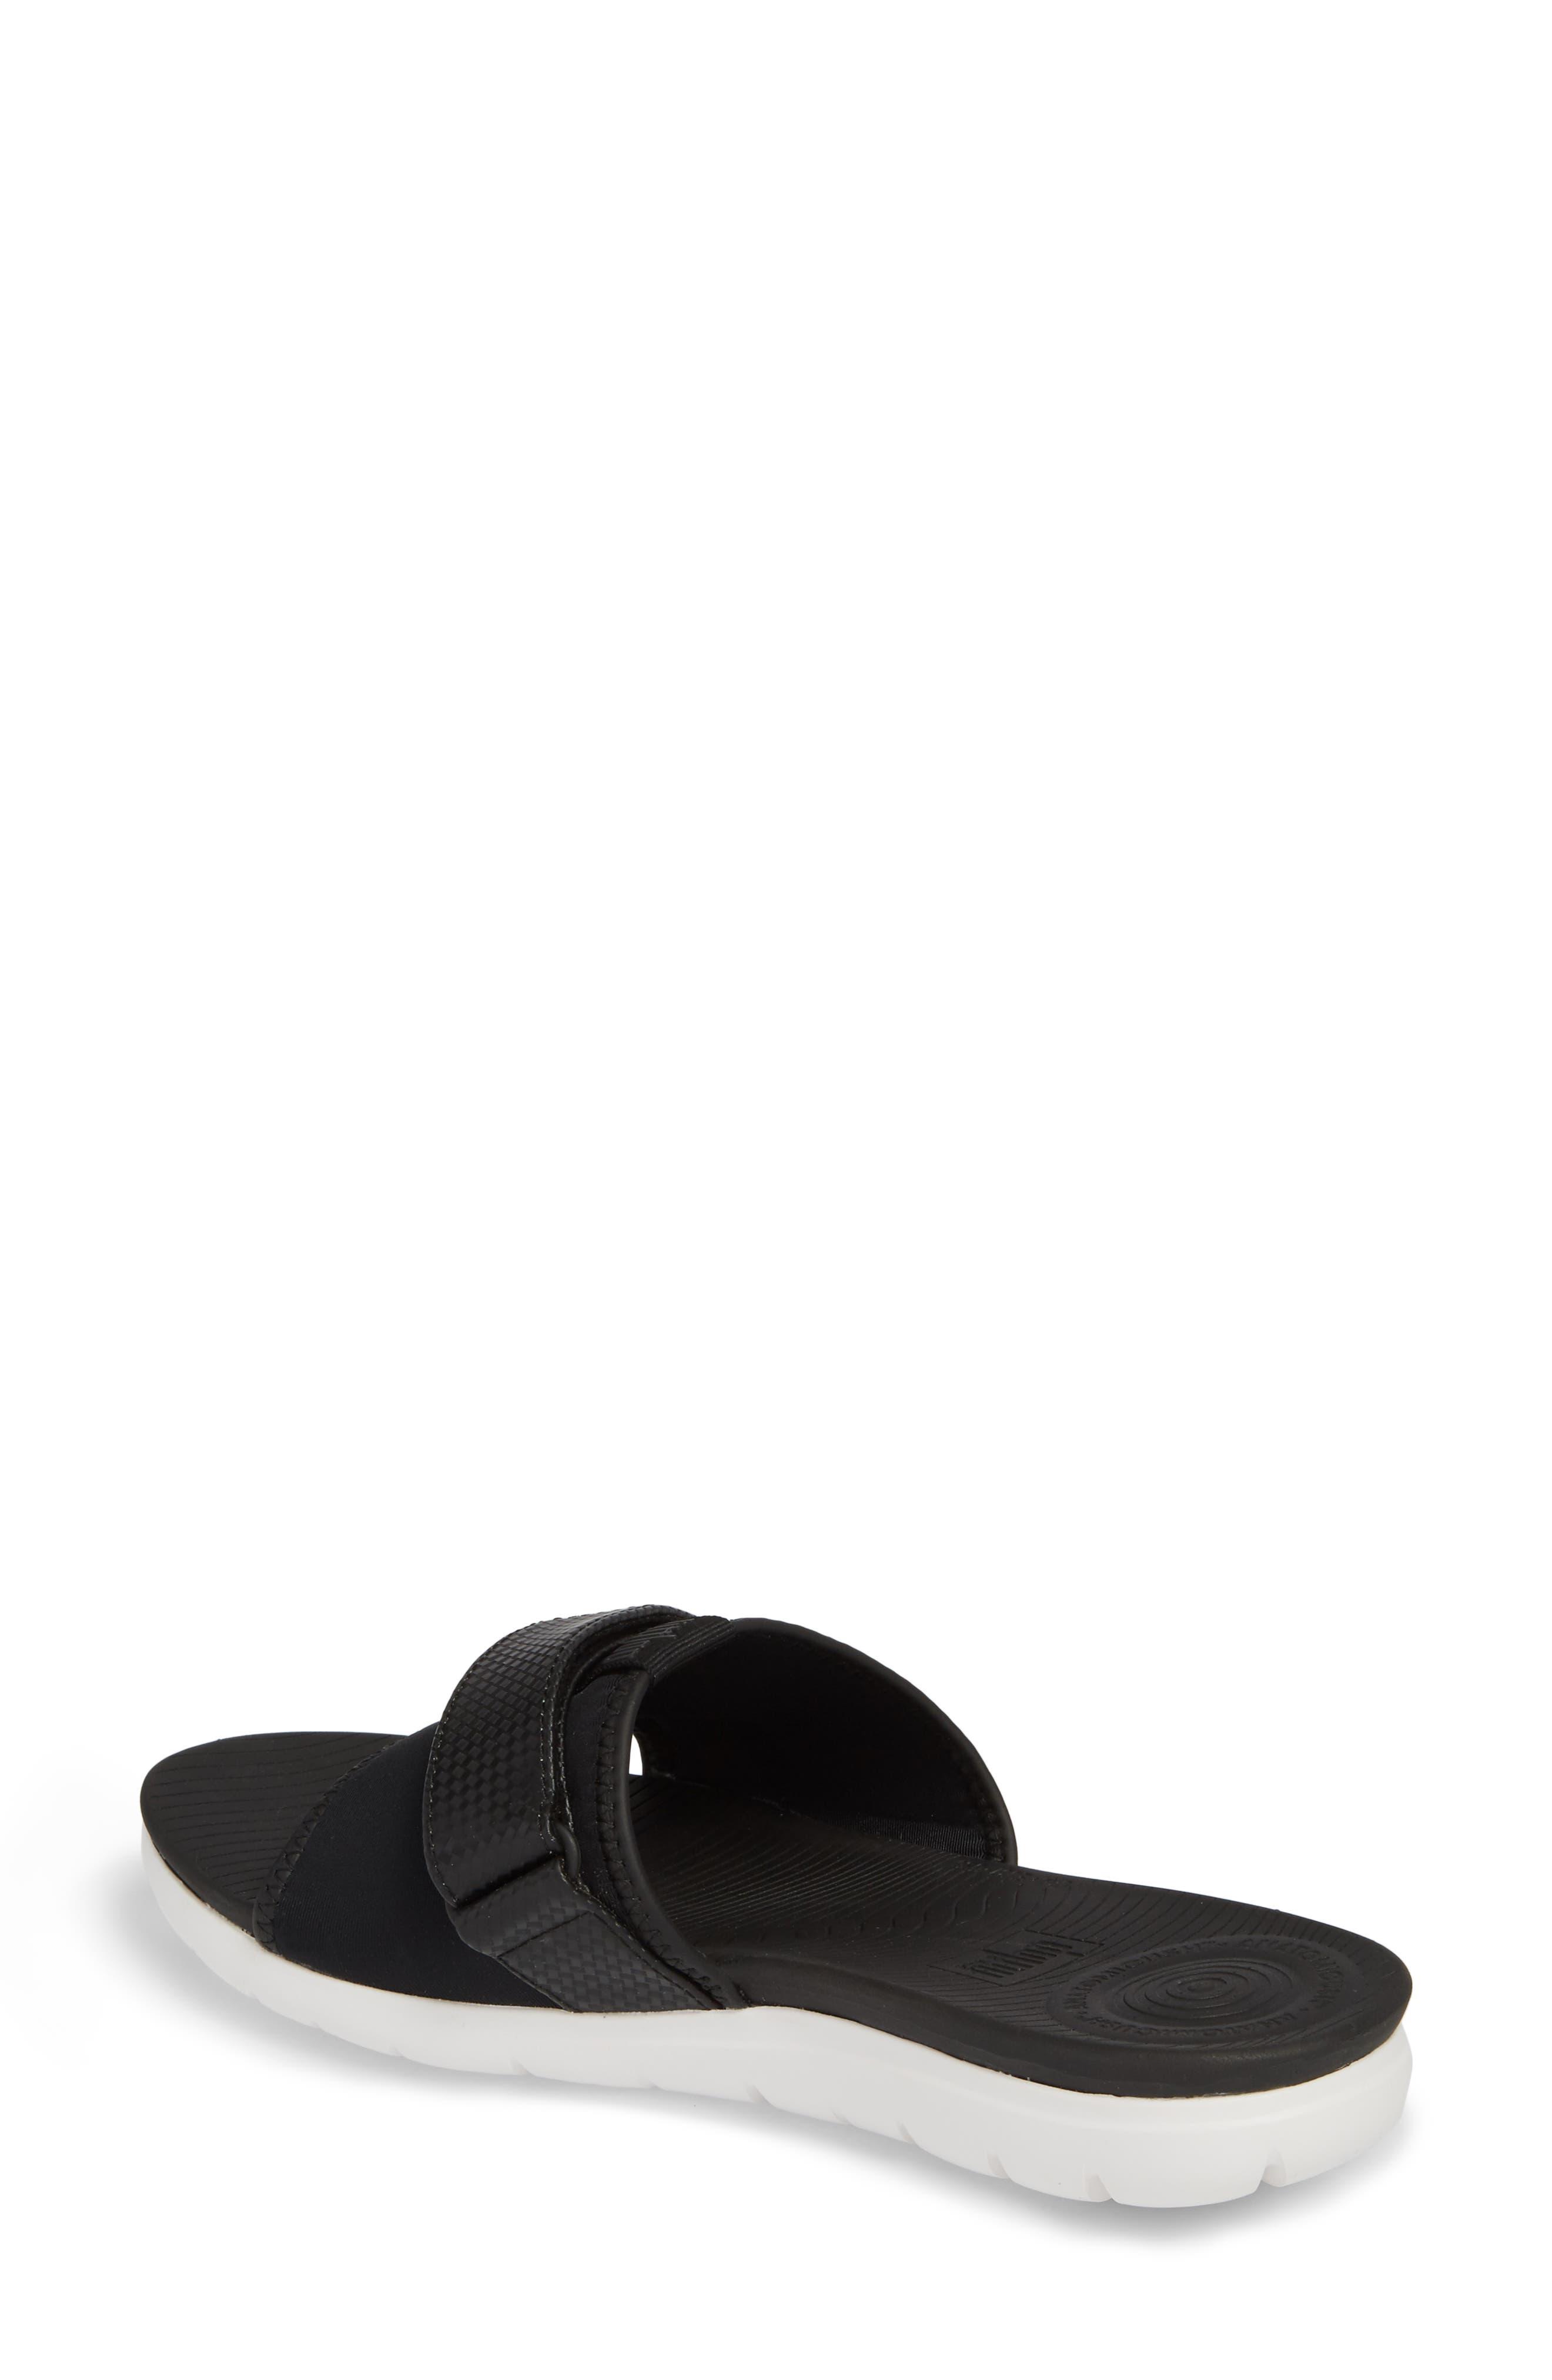 Neoflex Slide Sandal,                             Alternate thumbnail 2, color,                             BLACK FABRIC